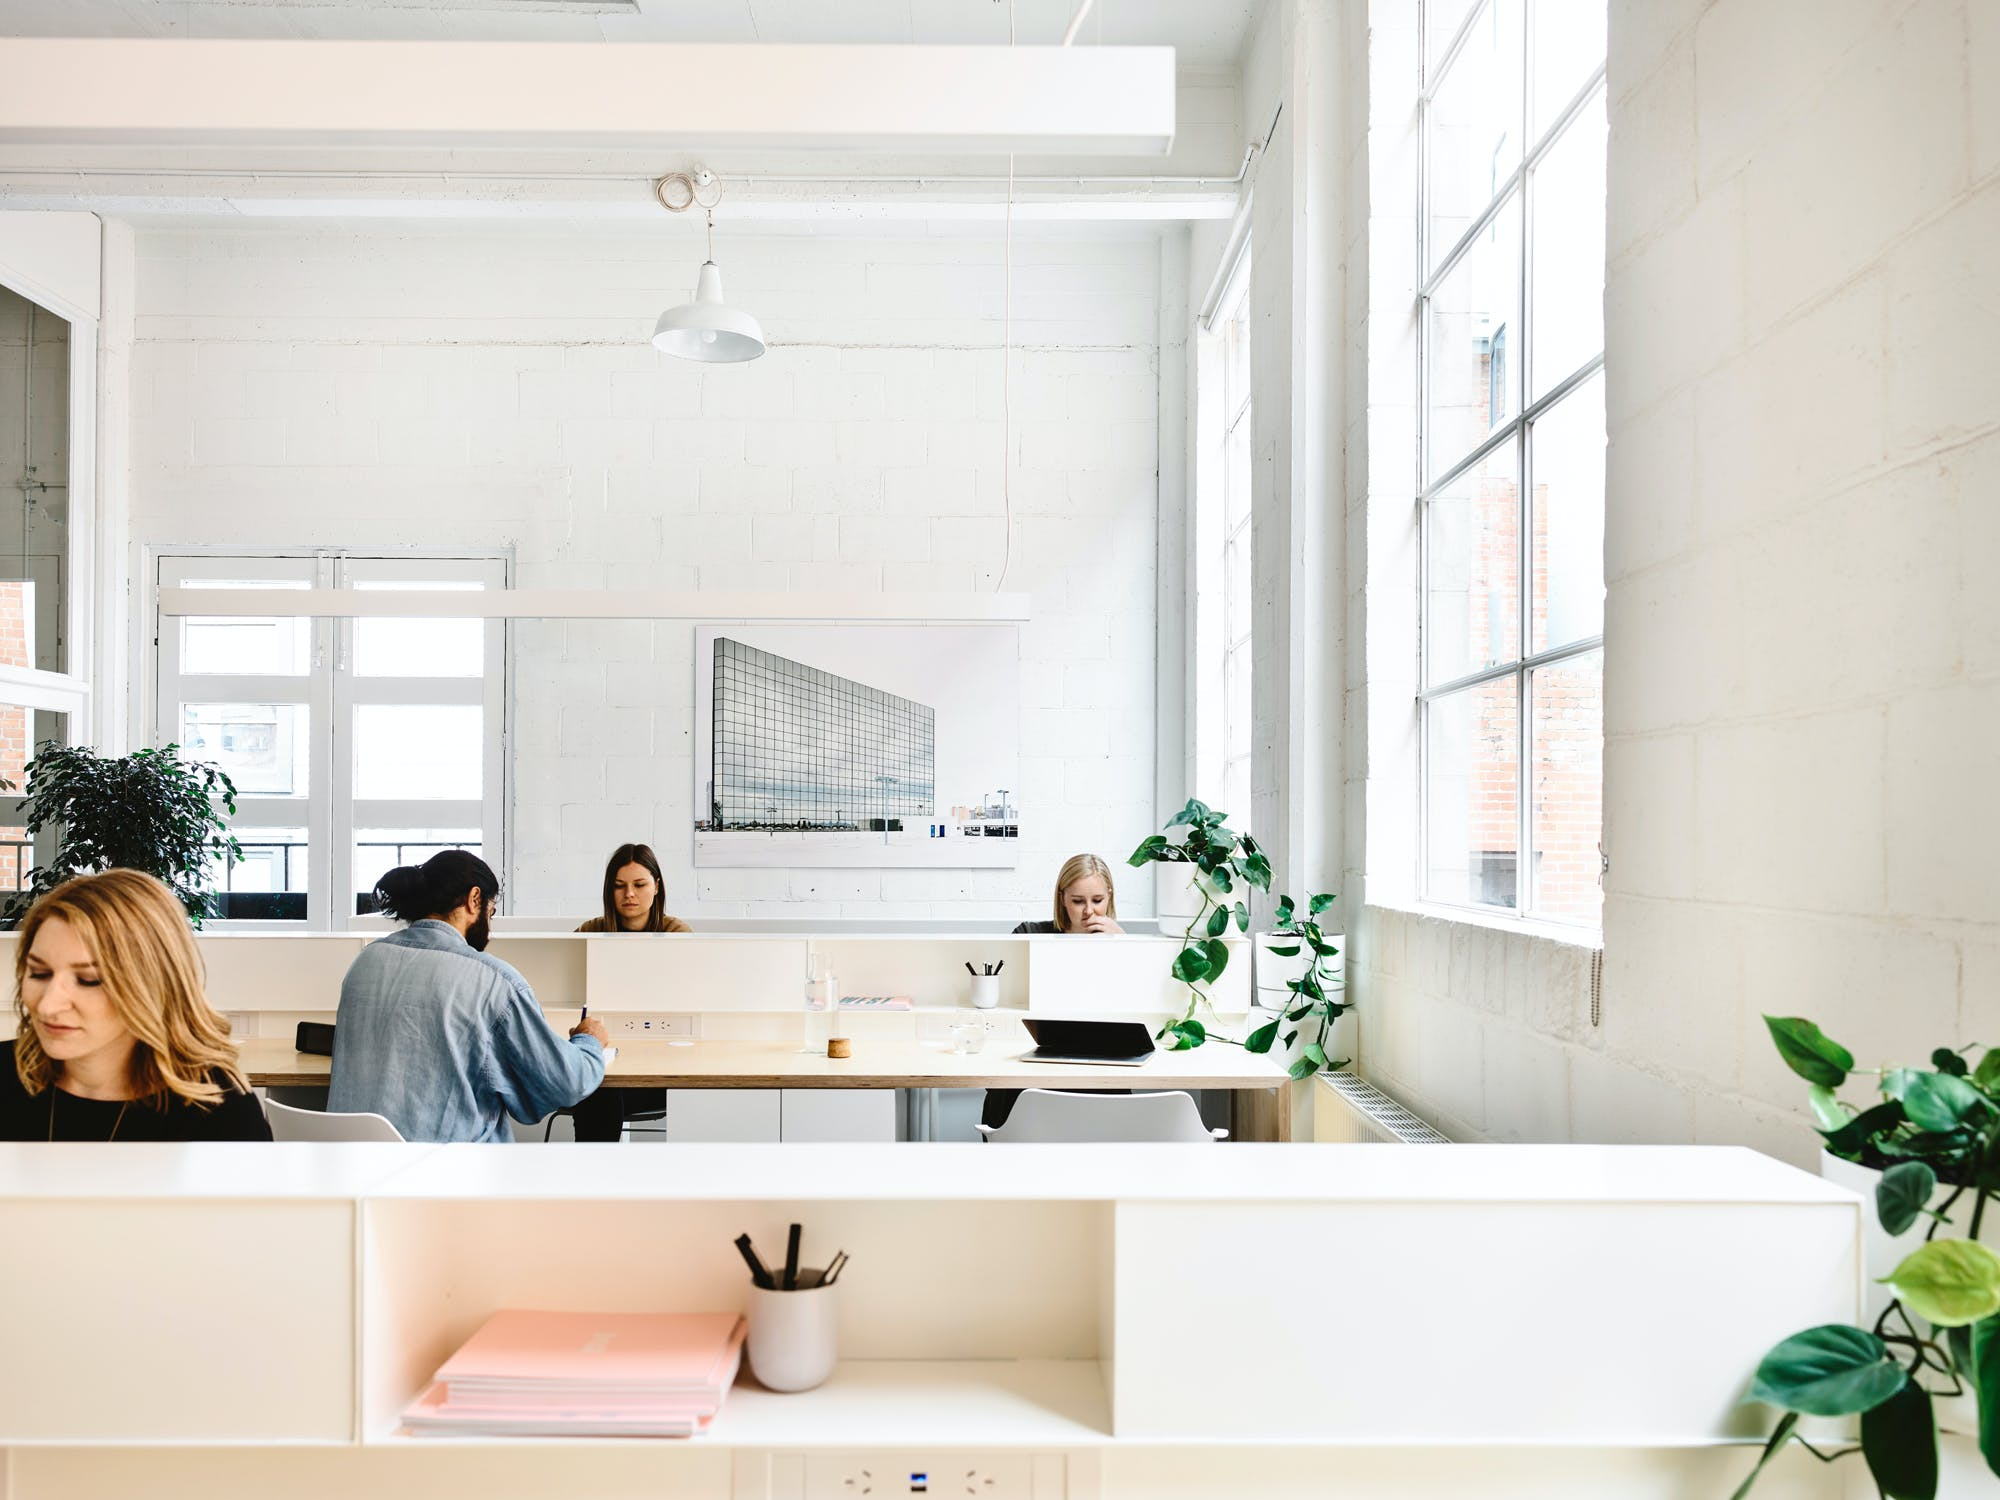 Dedicated desk at Building No.2, image 1